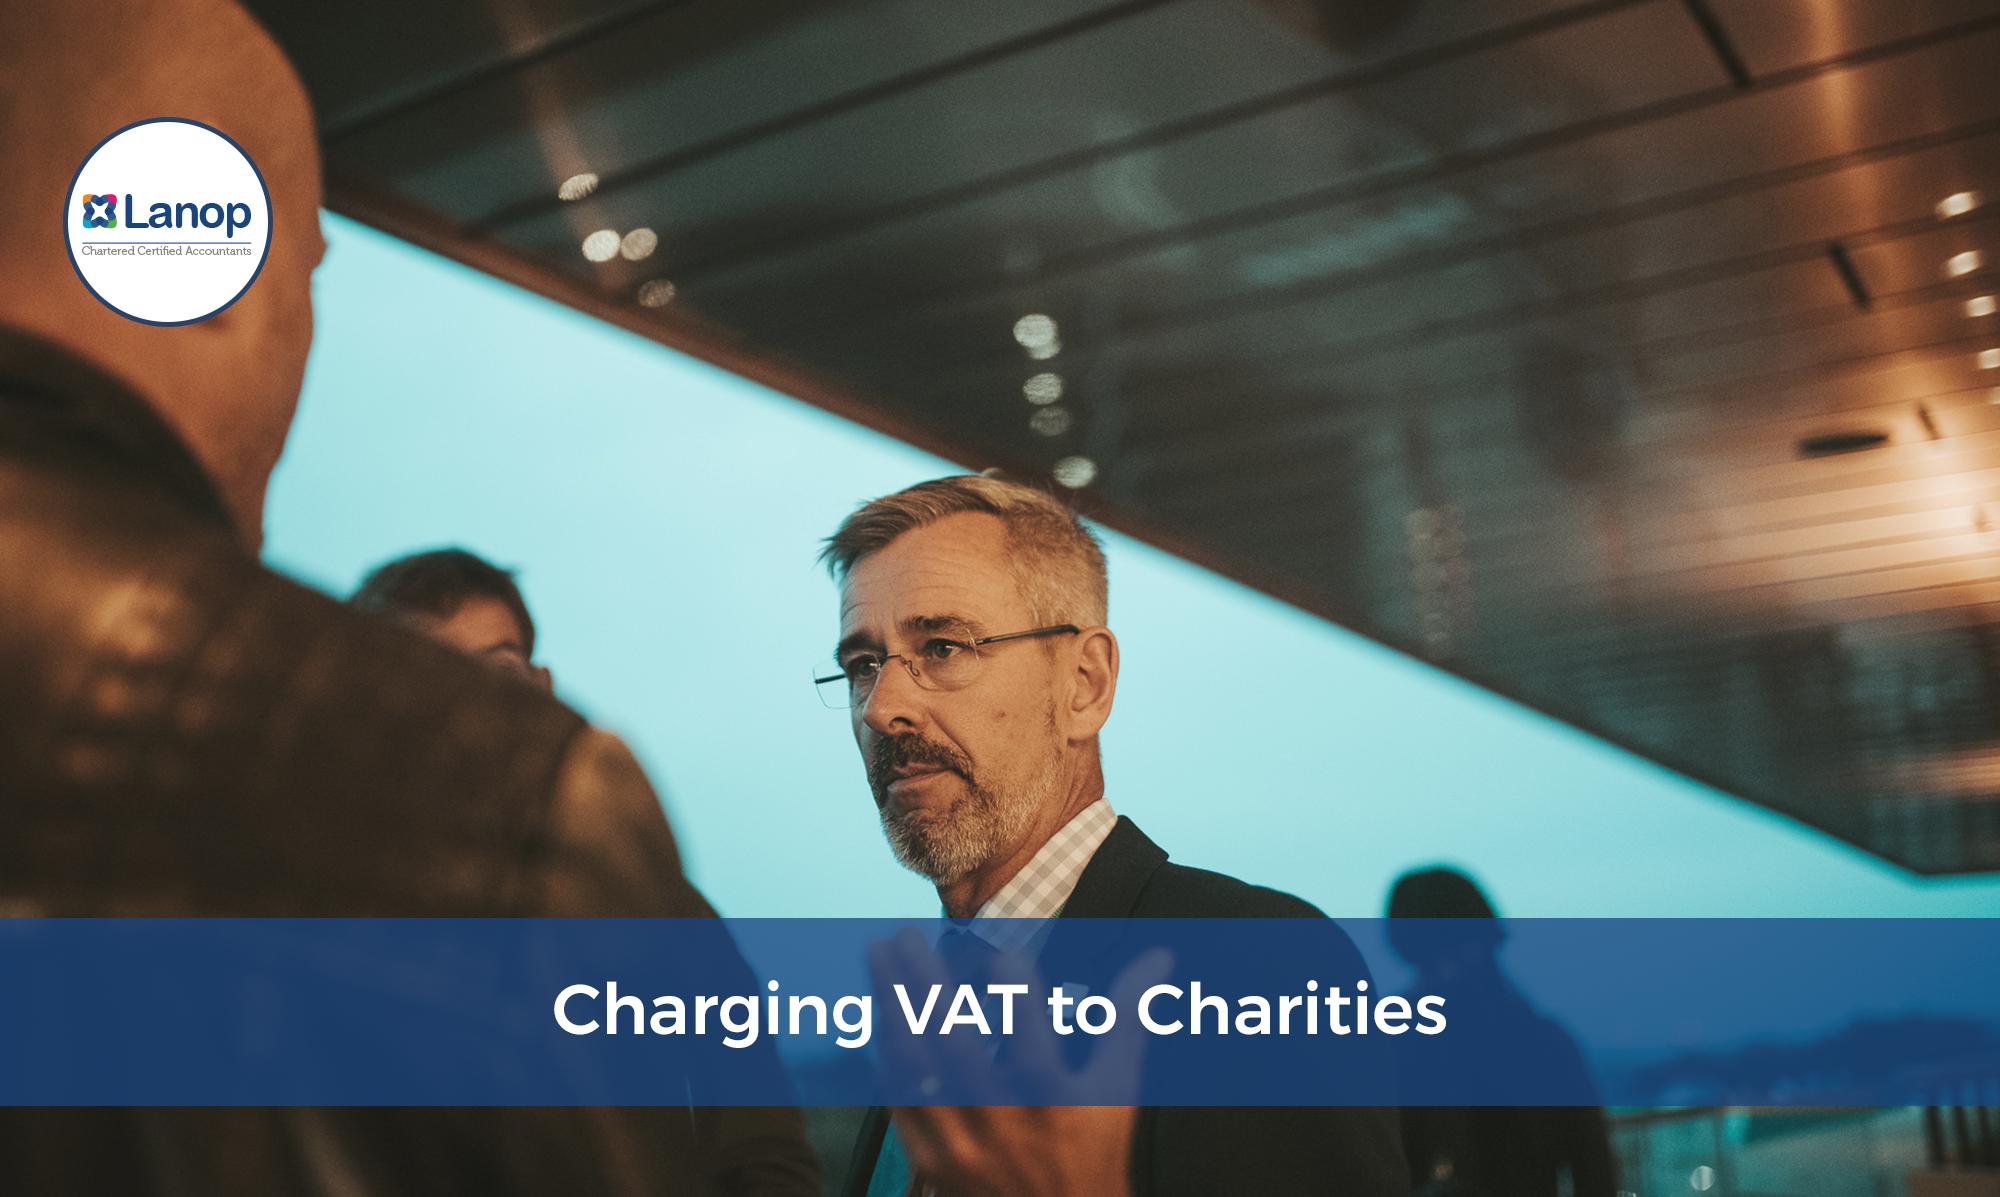 Charging VAT to Charities